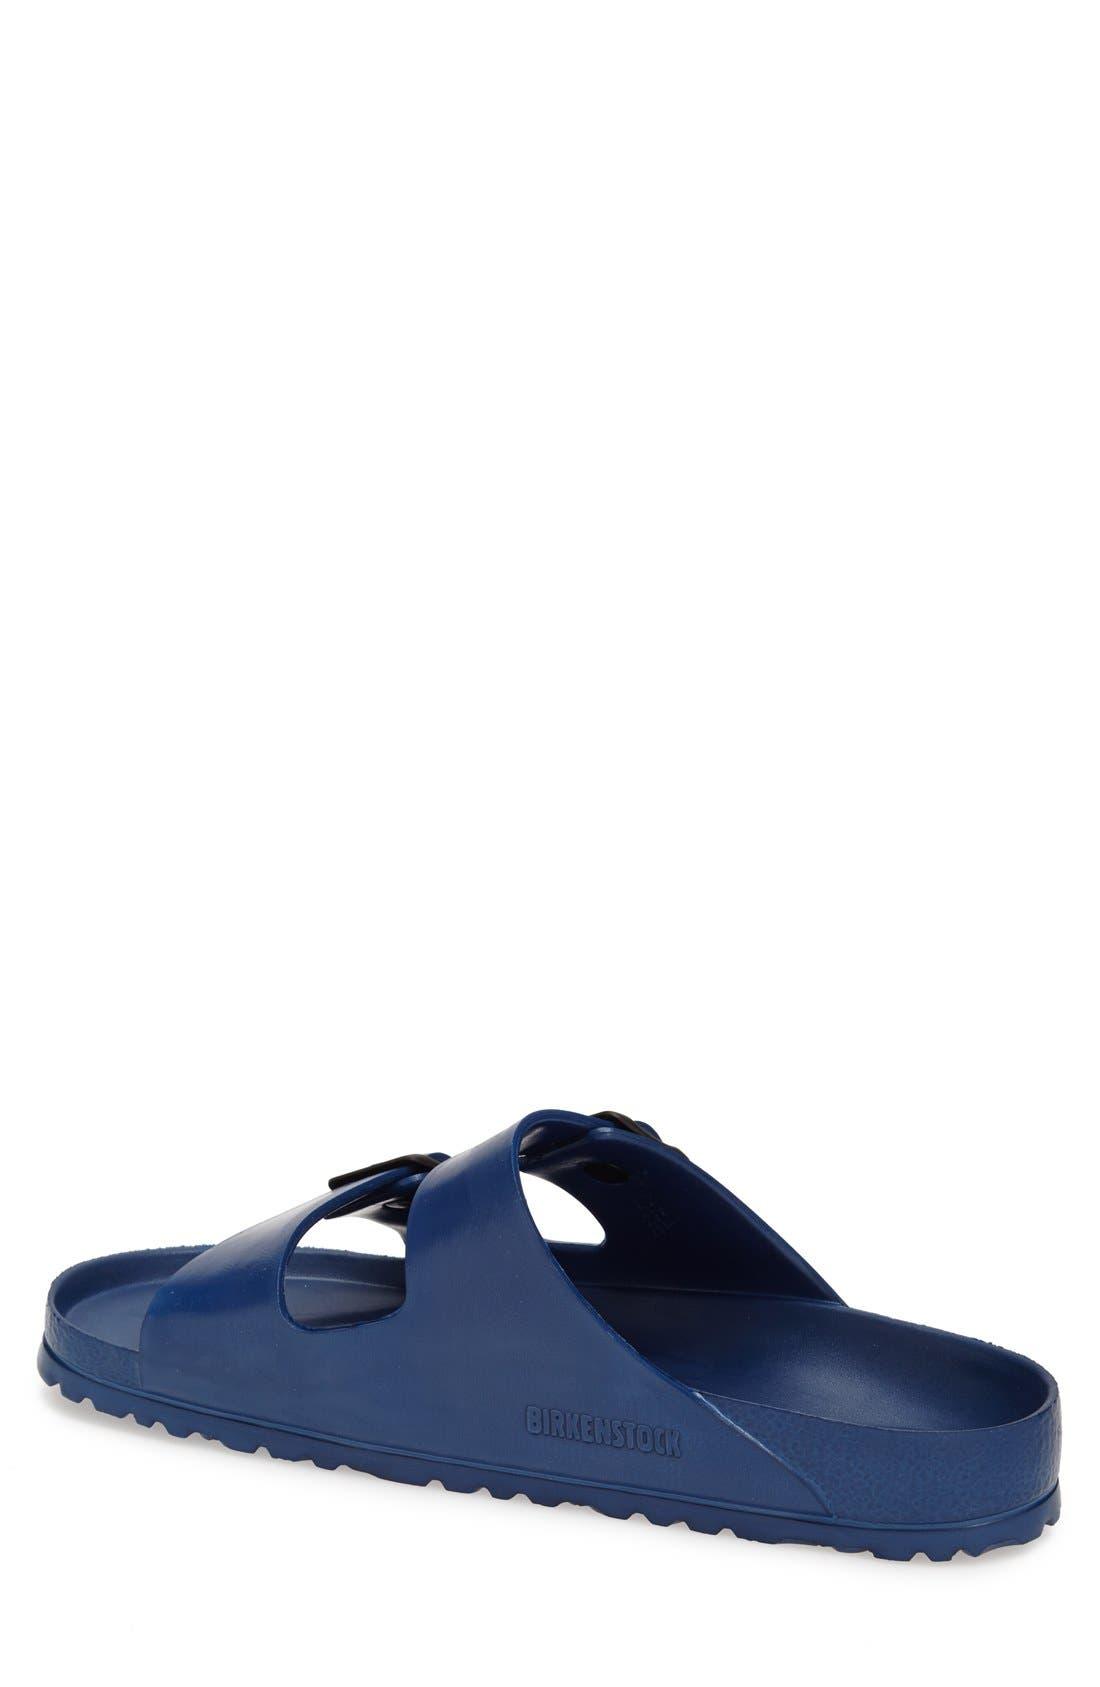 Alternate Image 2  - Birkenstock 'Essentials - Arizona EVA' Waterproof Slide Sandal (Men)